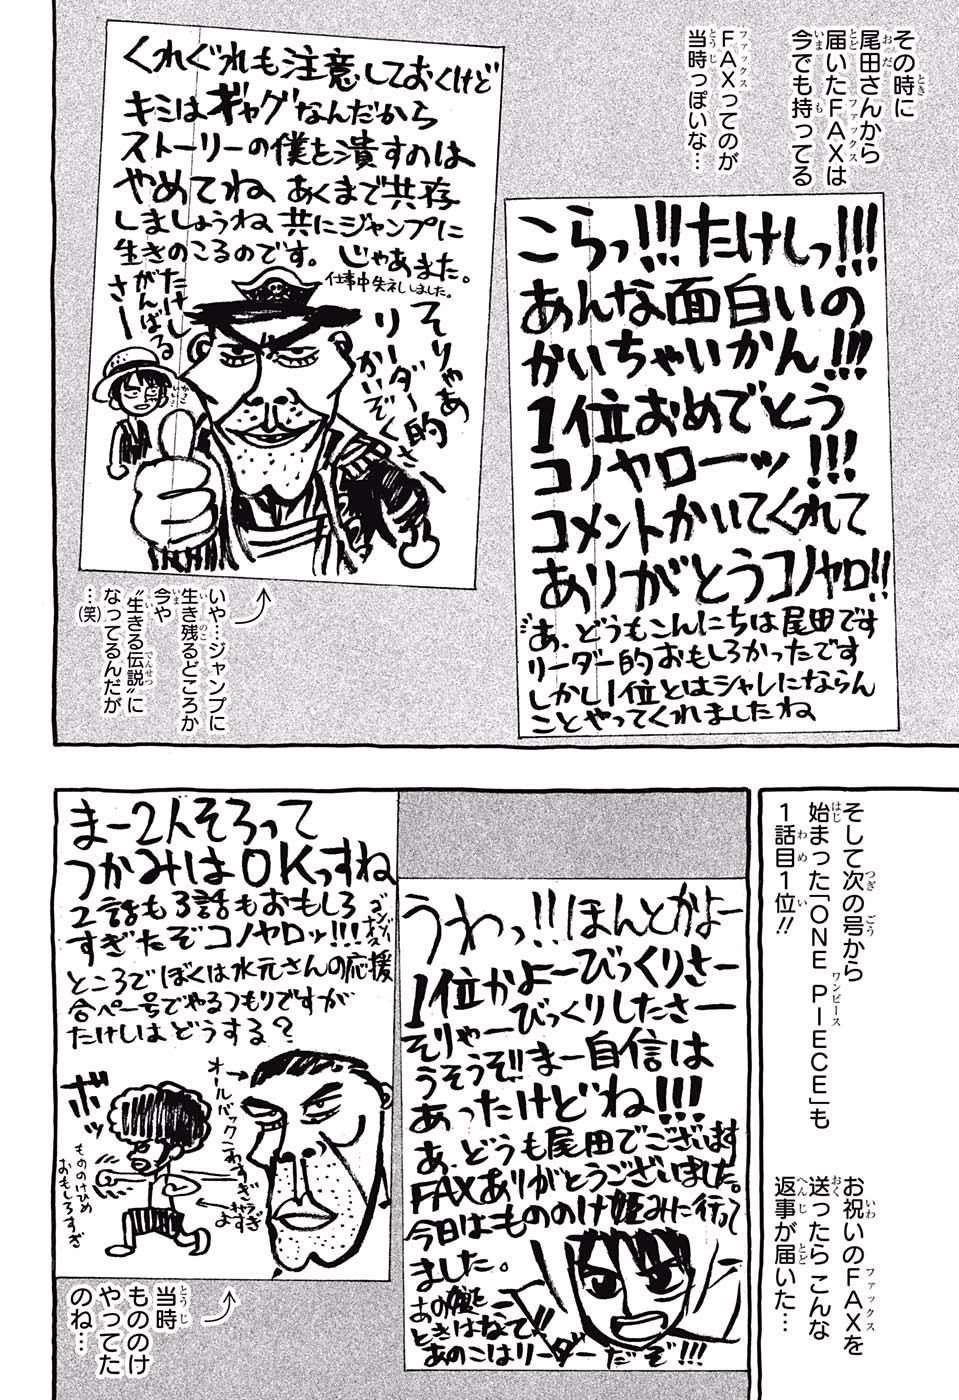 One Piece Manga 2017 PjNld38r